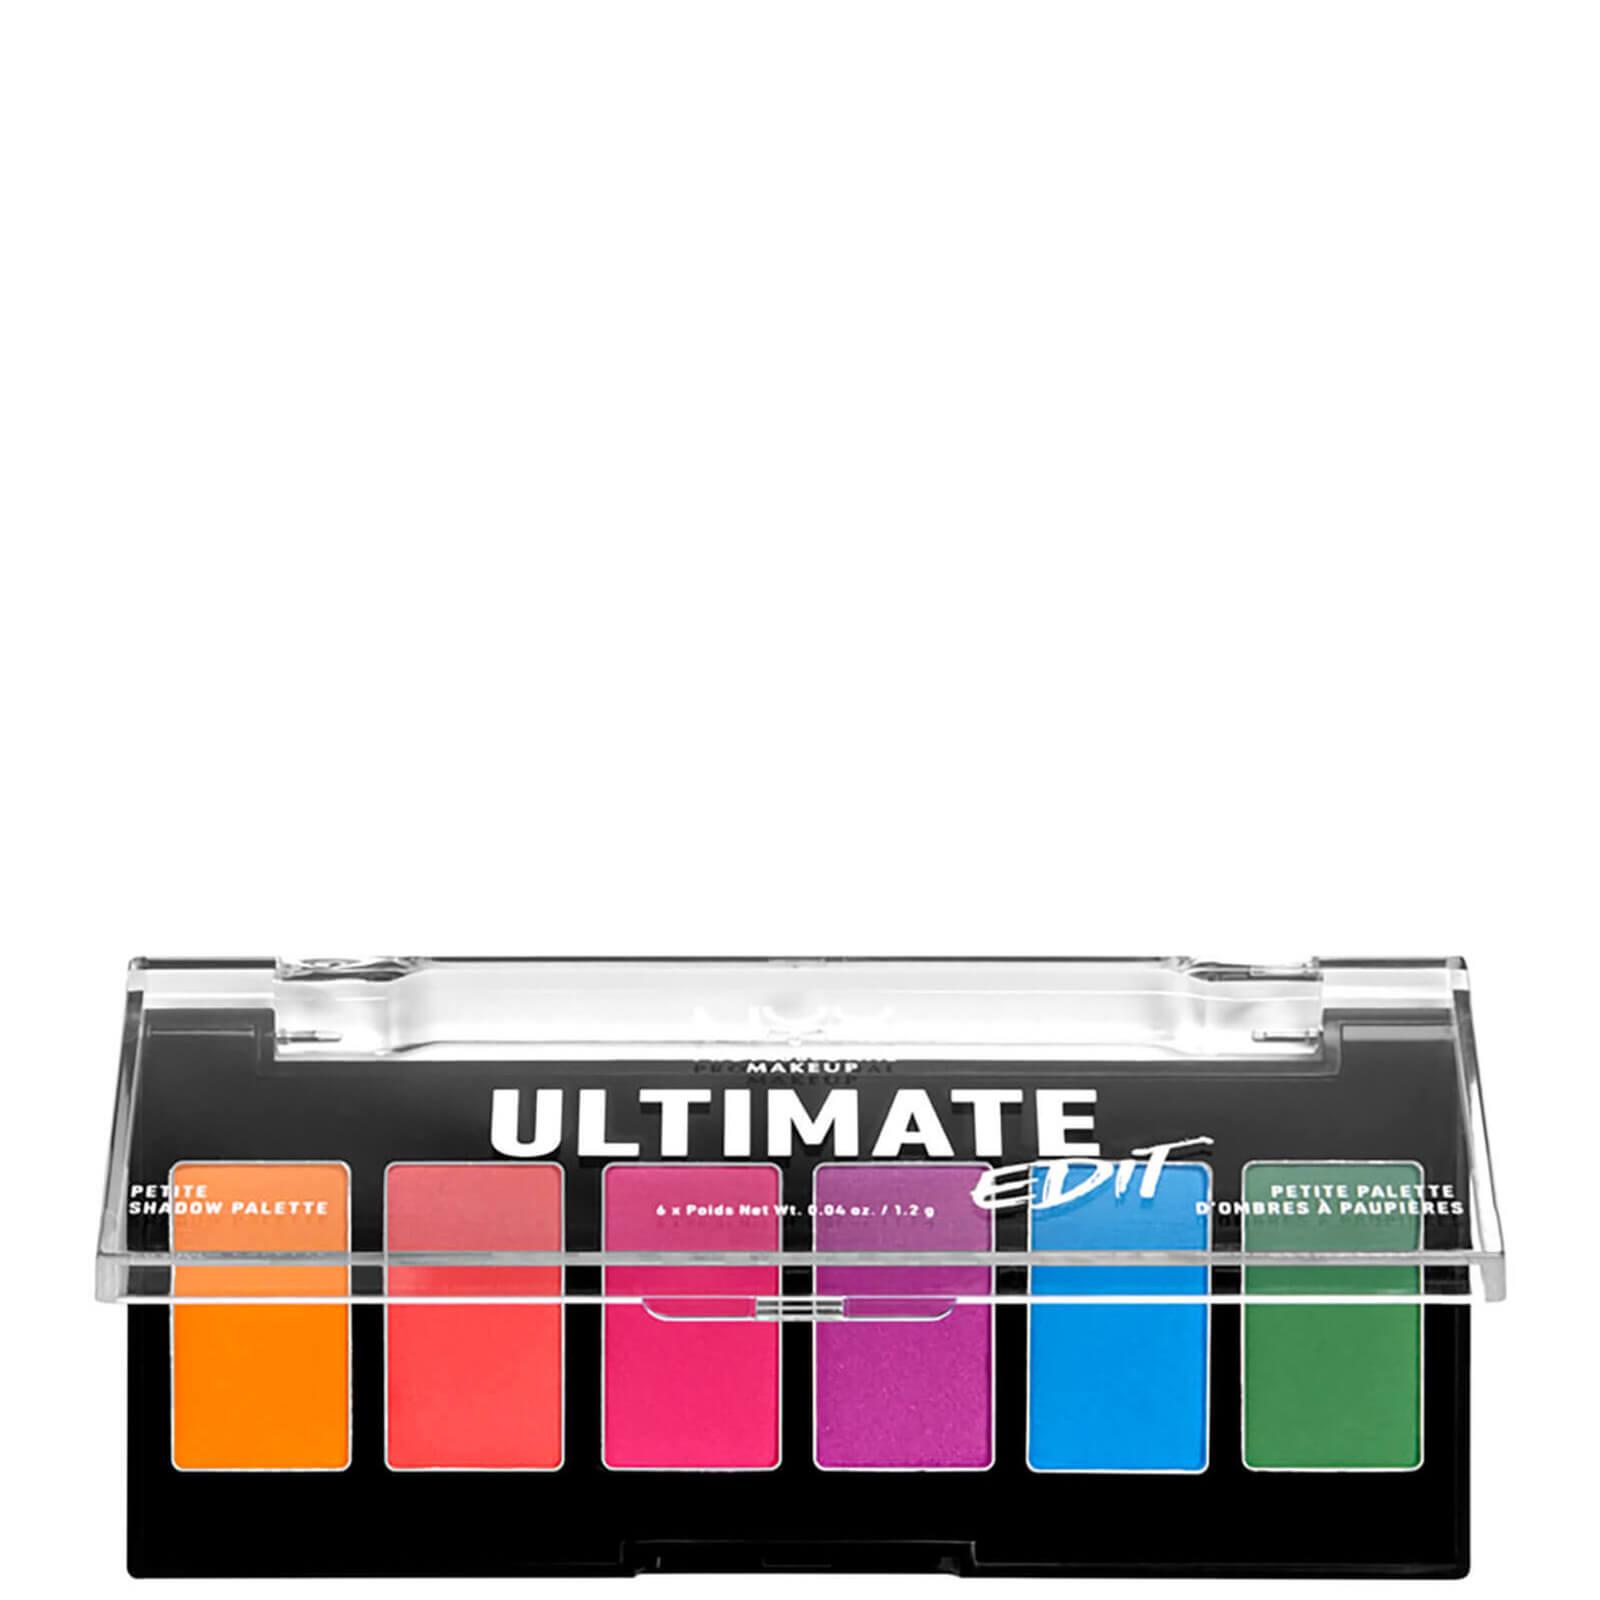 Купить NYX Professional Makeup Ultimate Edit Petite Eye Shadow Palette - Brights